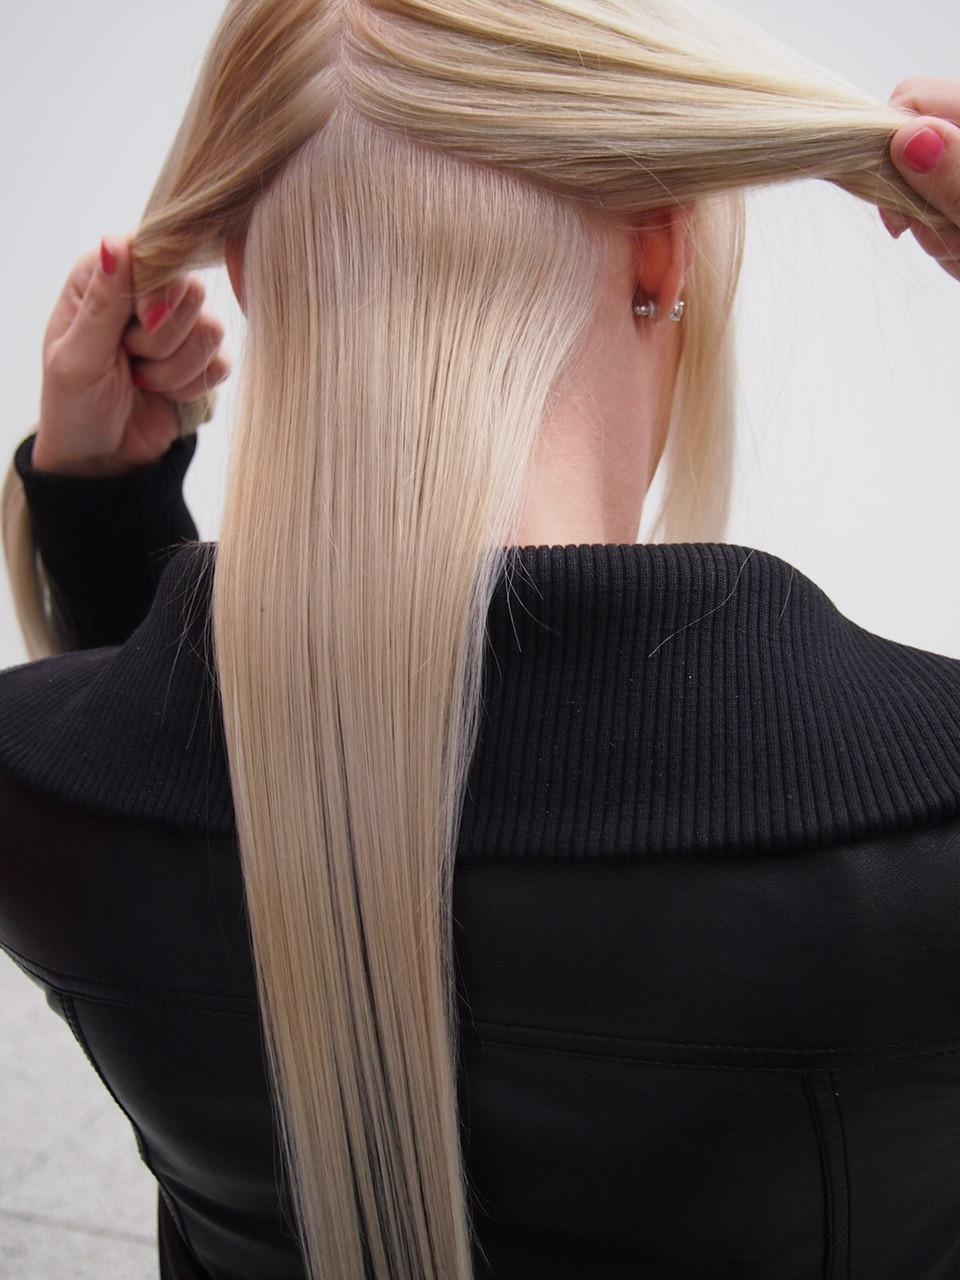 hiusvärit kylmät sävyt